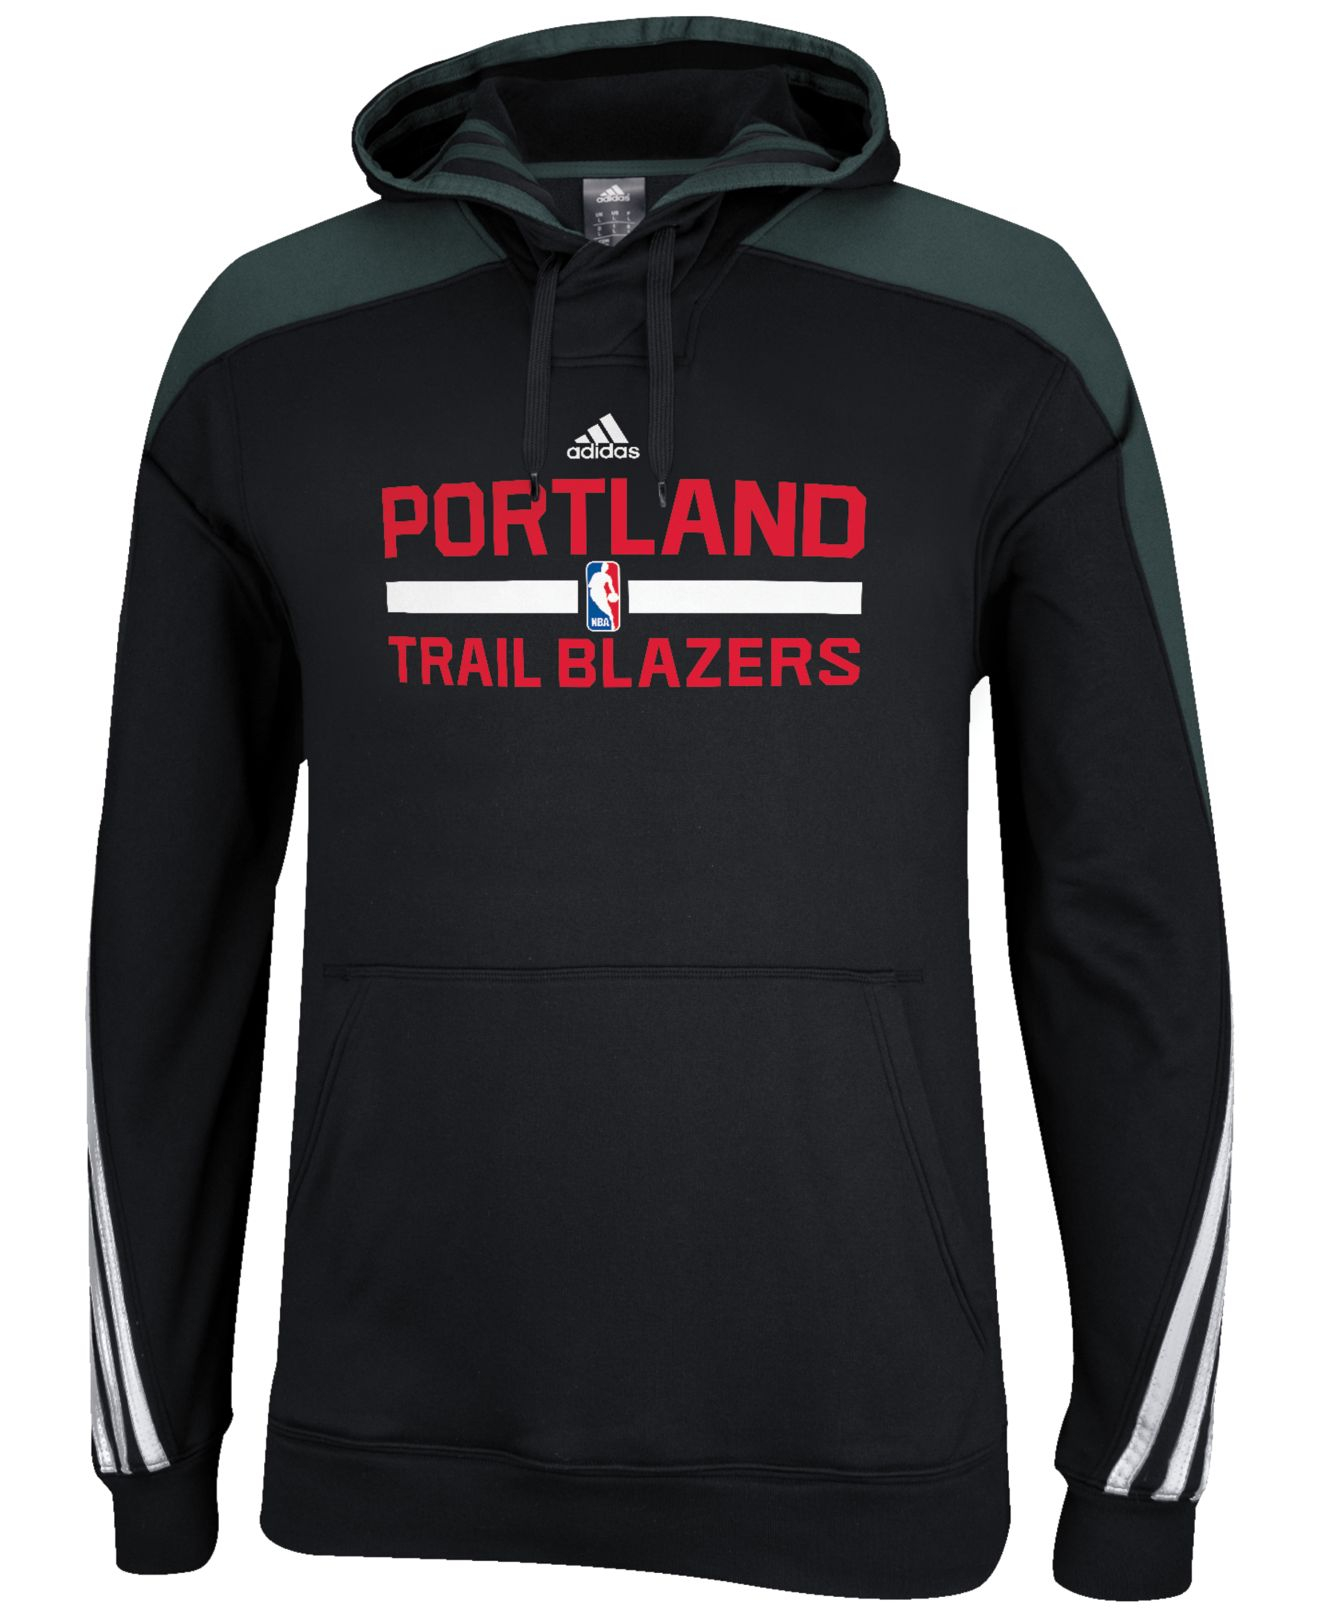 Adidas Men's Portland Trail Blazers Practice Hoodie